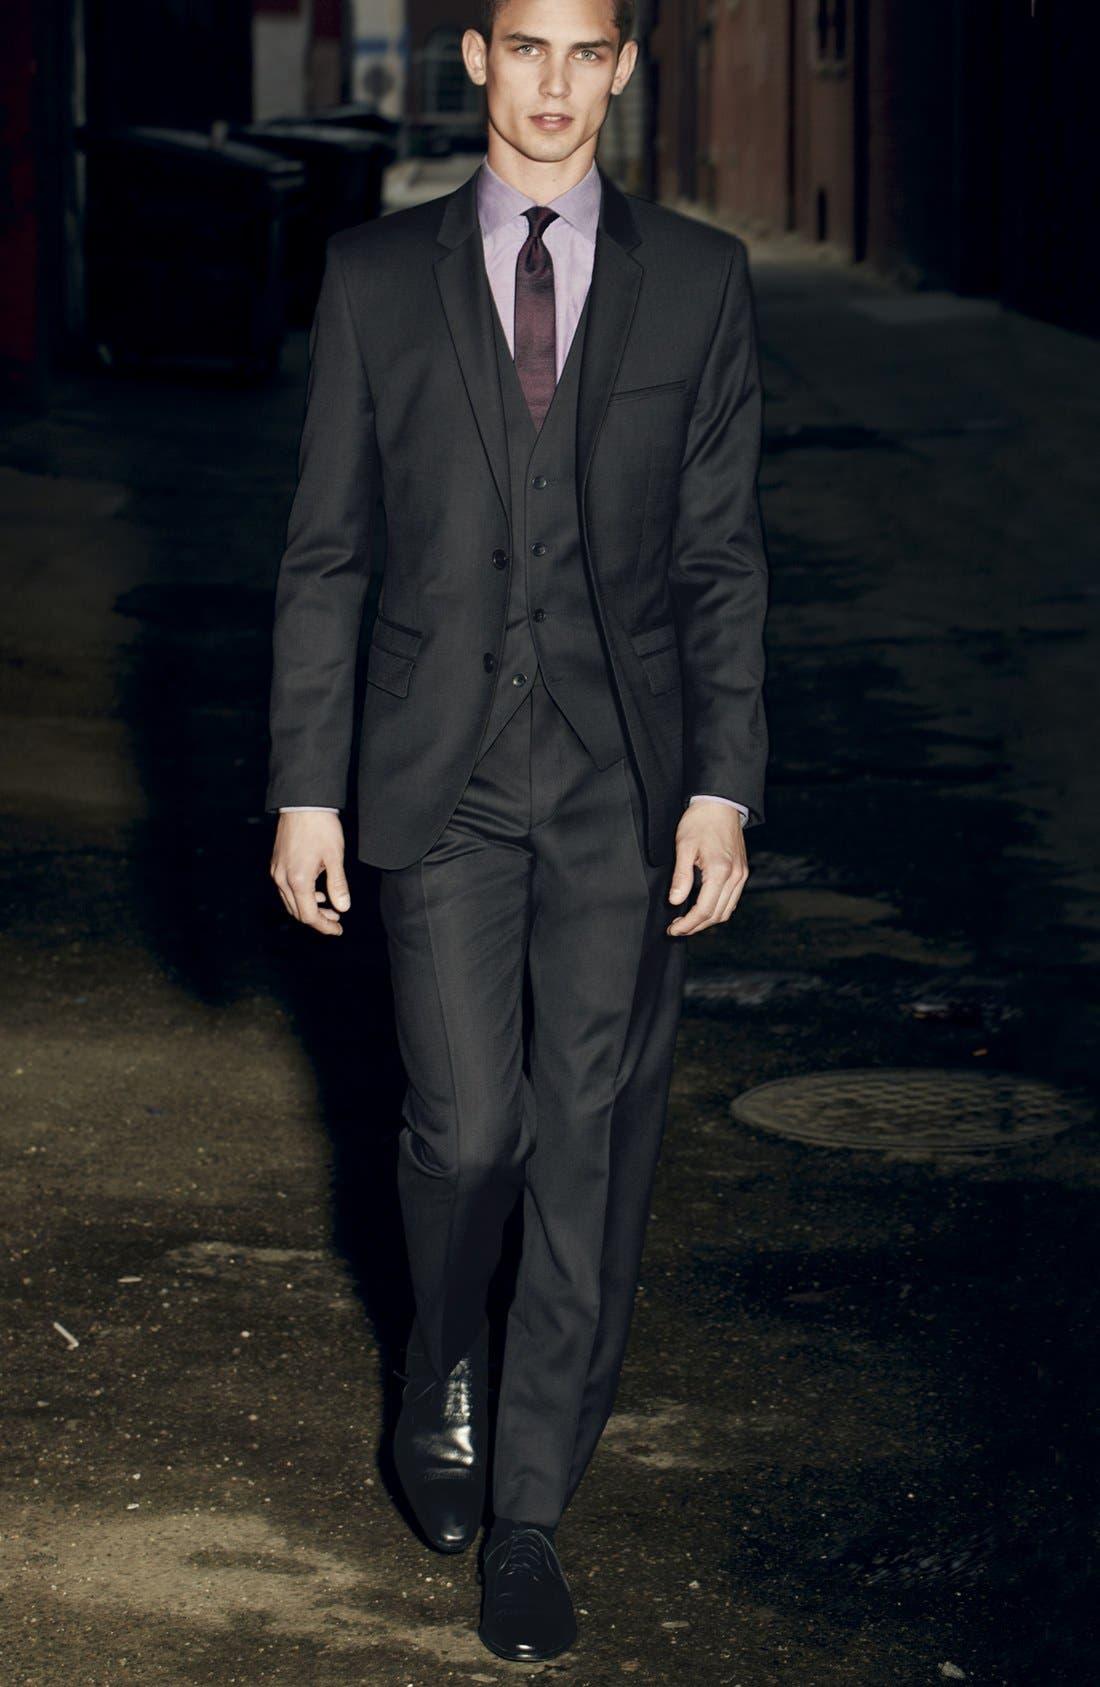 Alternate Image 1 Selected - HUGO Suit & BOSS HUGO BOSS Dress Shirt